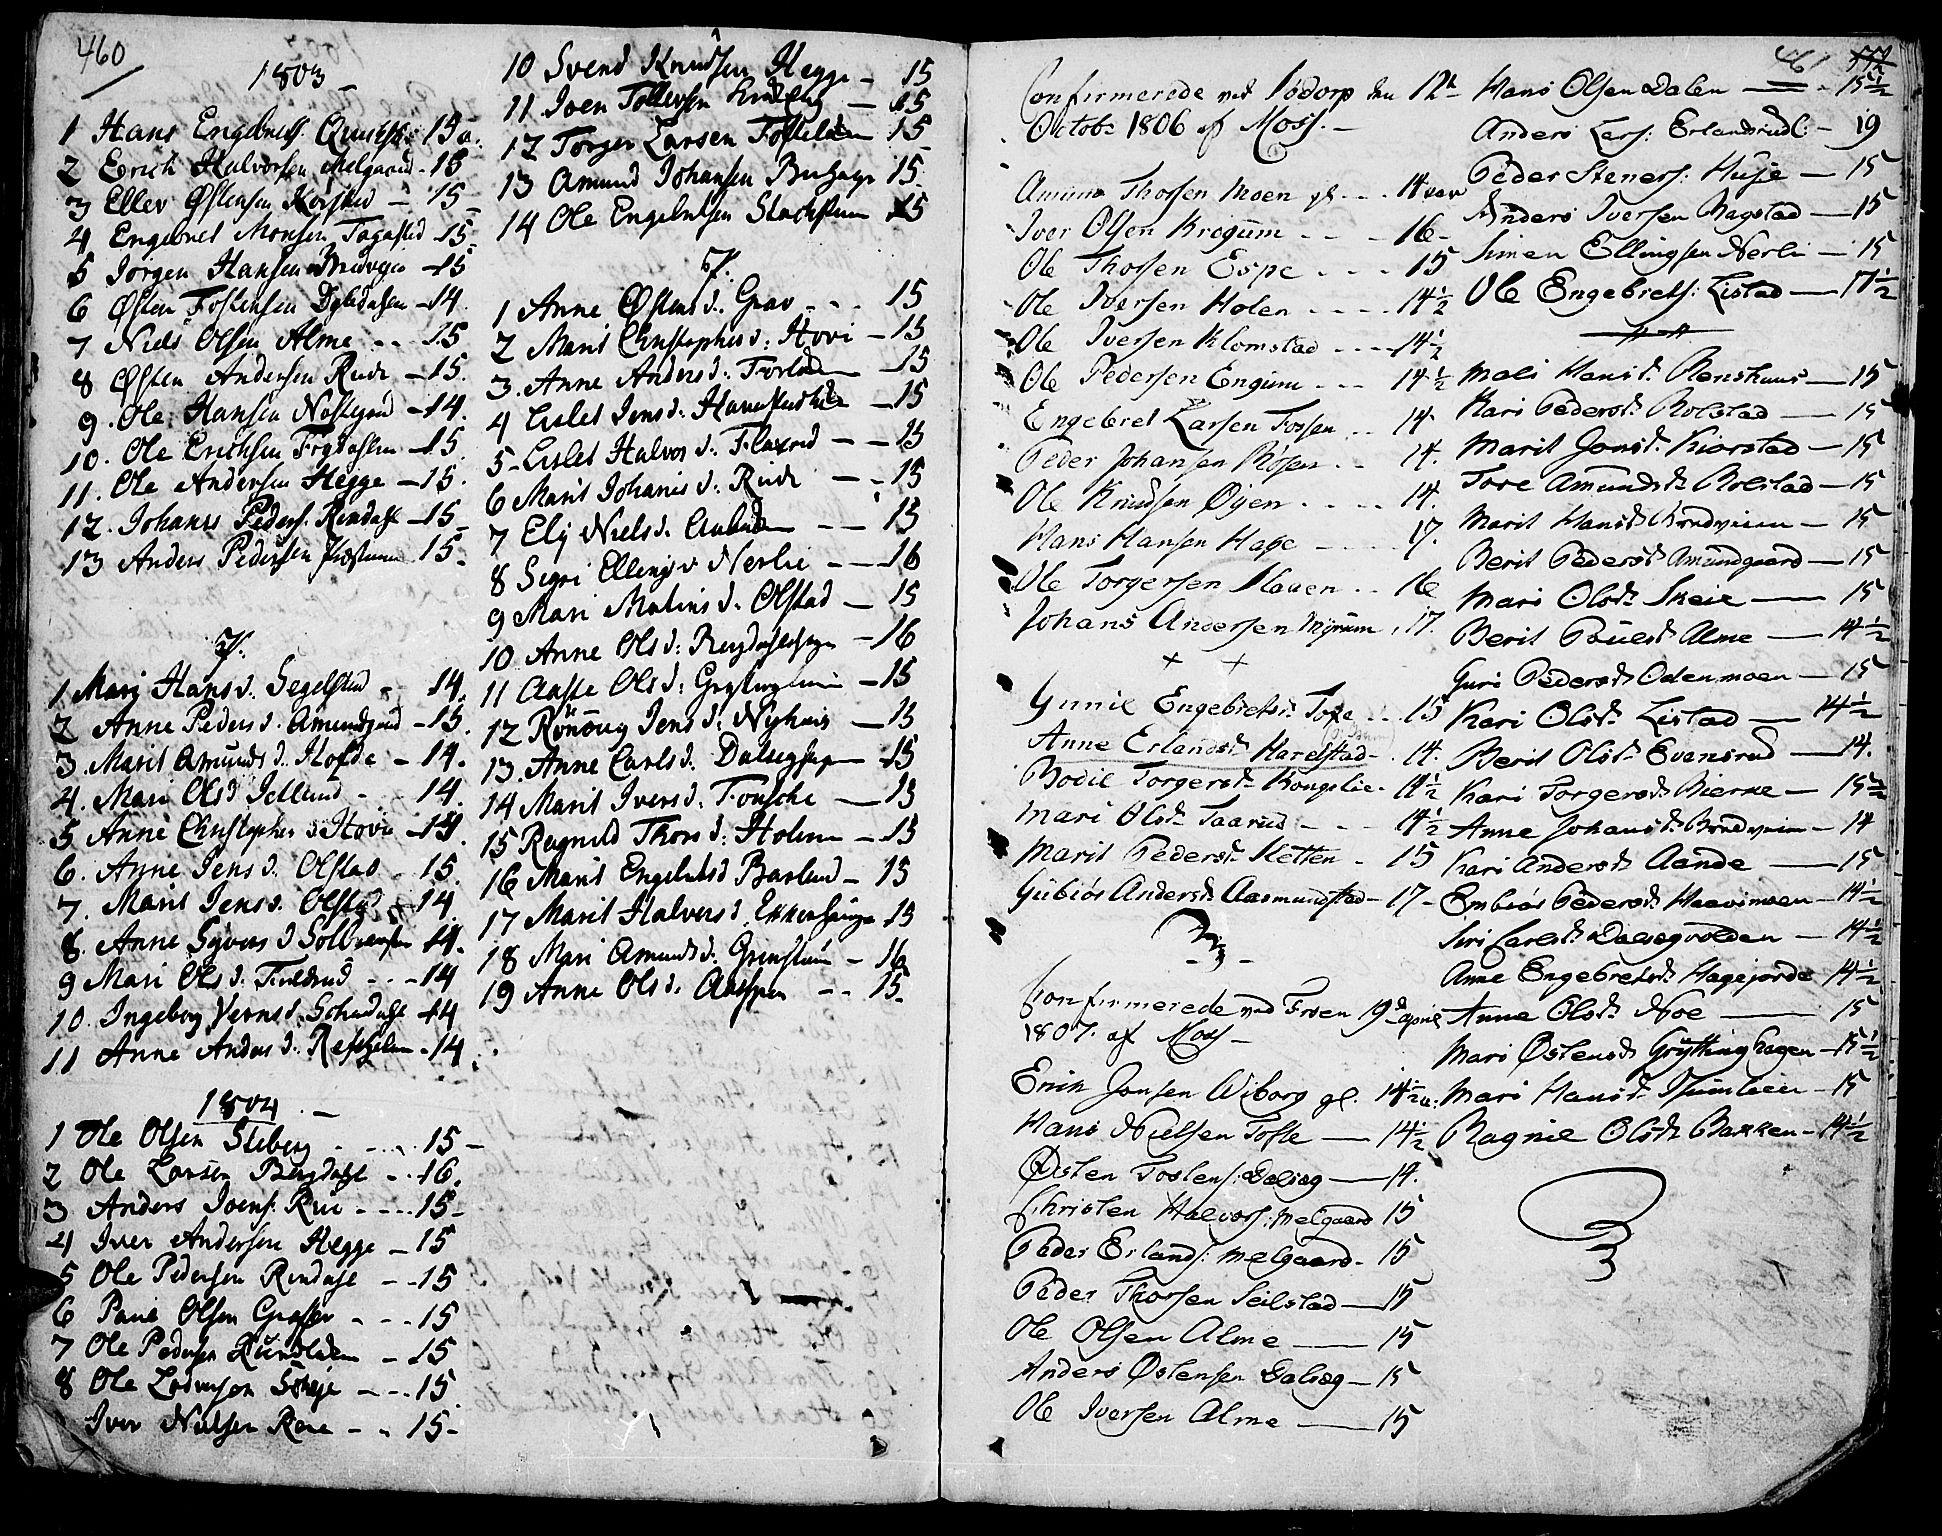 SAH, Fron prestekontor, H/Ha/Haa/L0001: Ministerialbok nr. 1, 1799-1816, s. 460-461